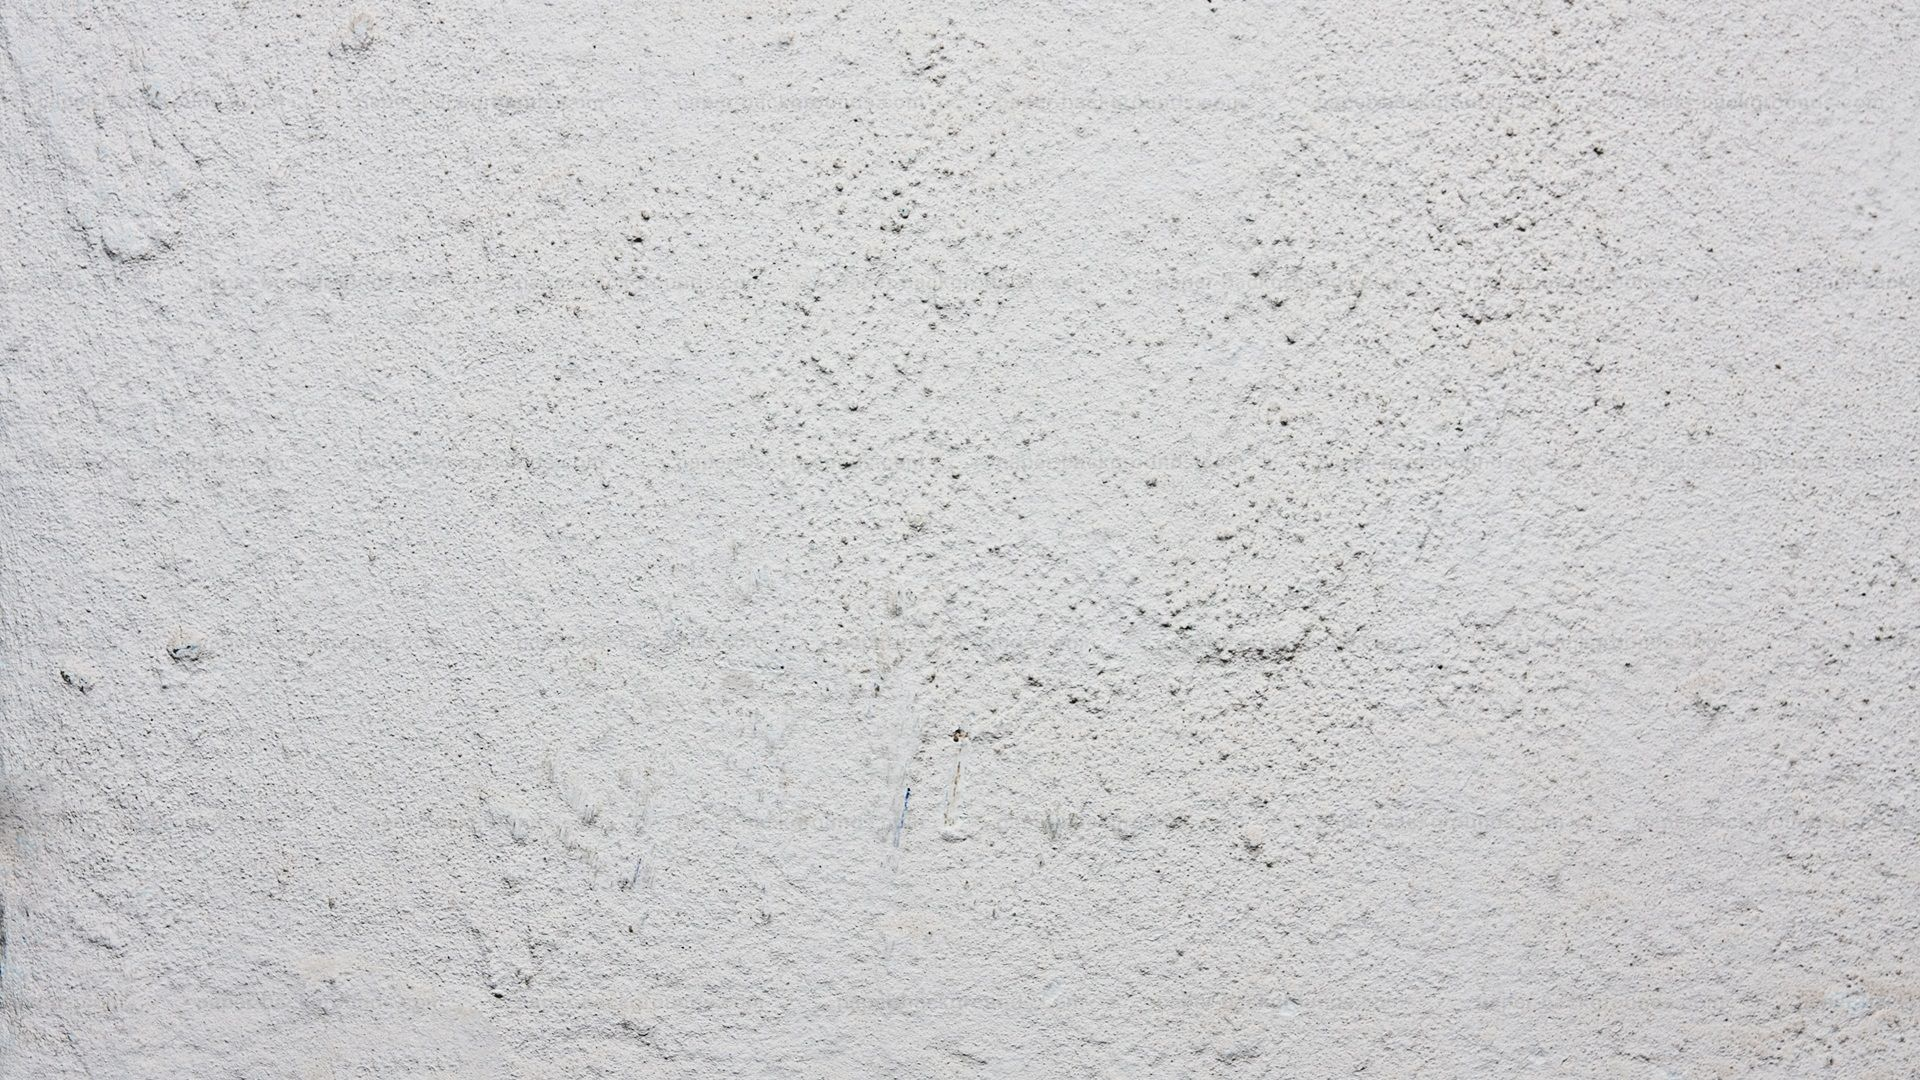 White Concrete Wall Texture Hd1 Jpg 1920 1080 Concrete Wall Texture Textured Walls Concrete Wall